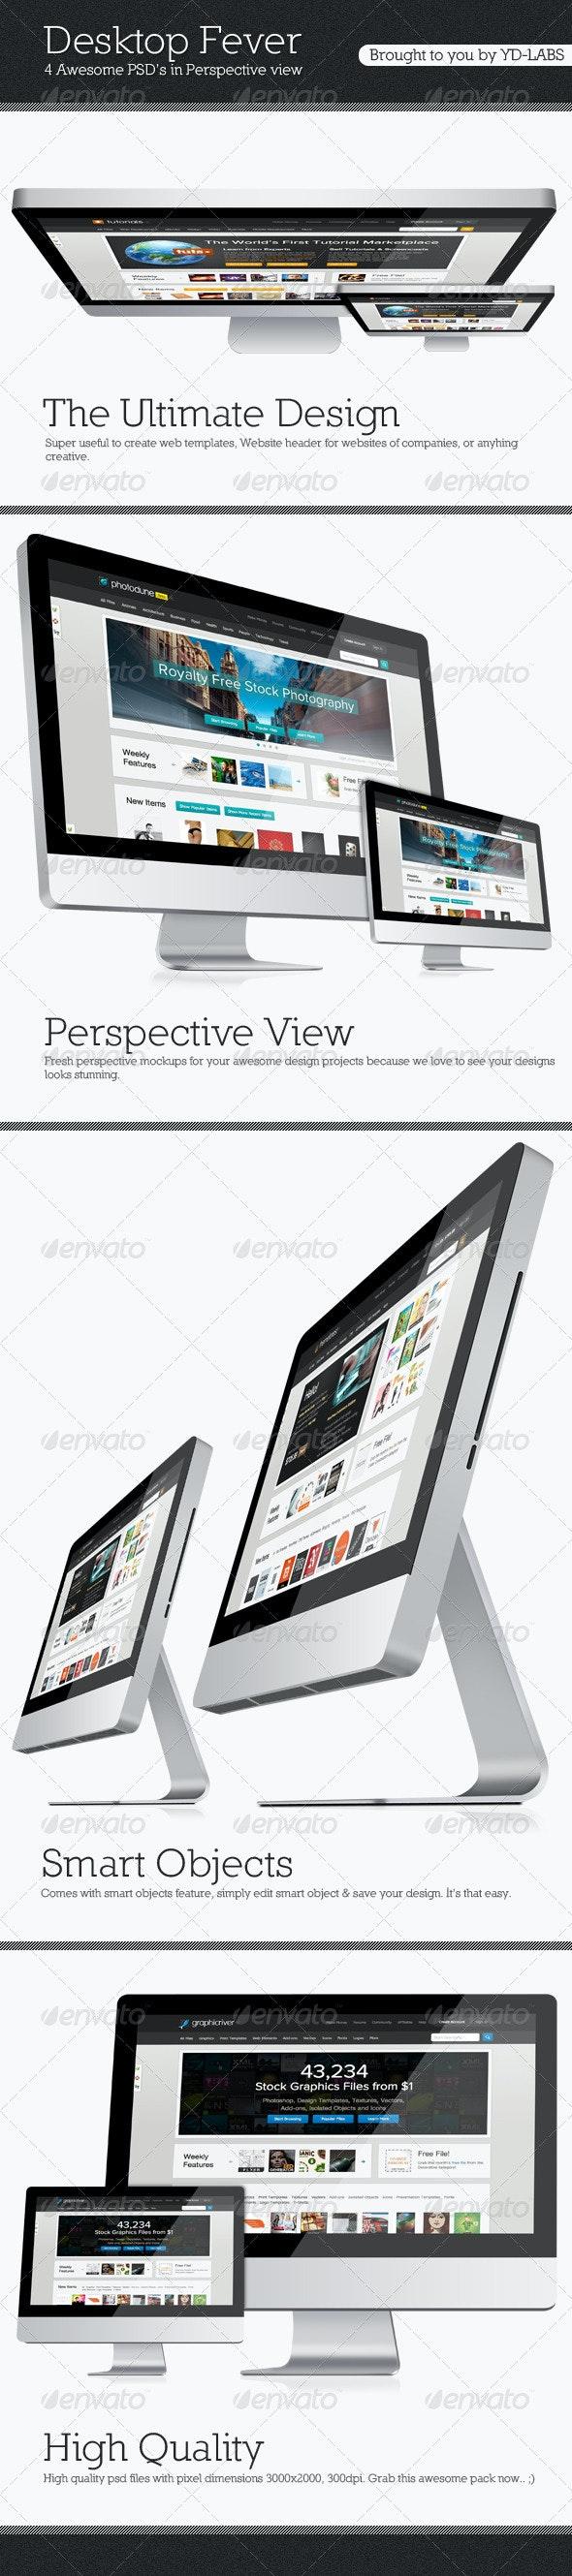 Desktop Fever Mockup Pack - Monitors Displays